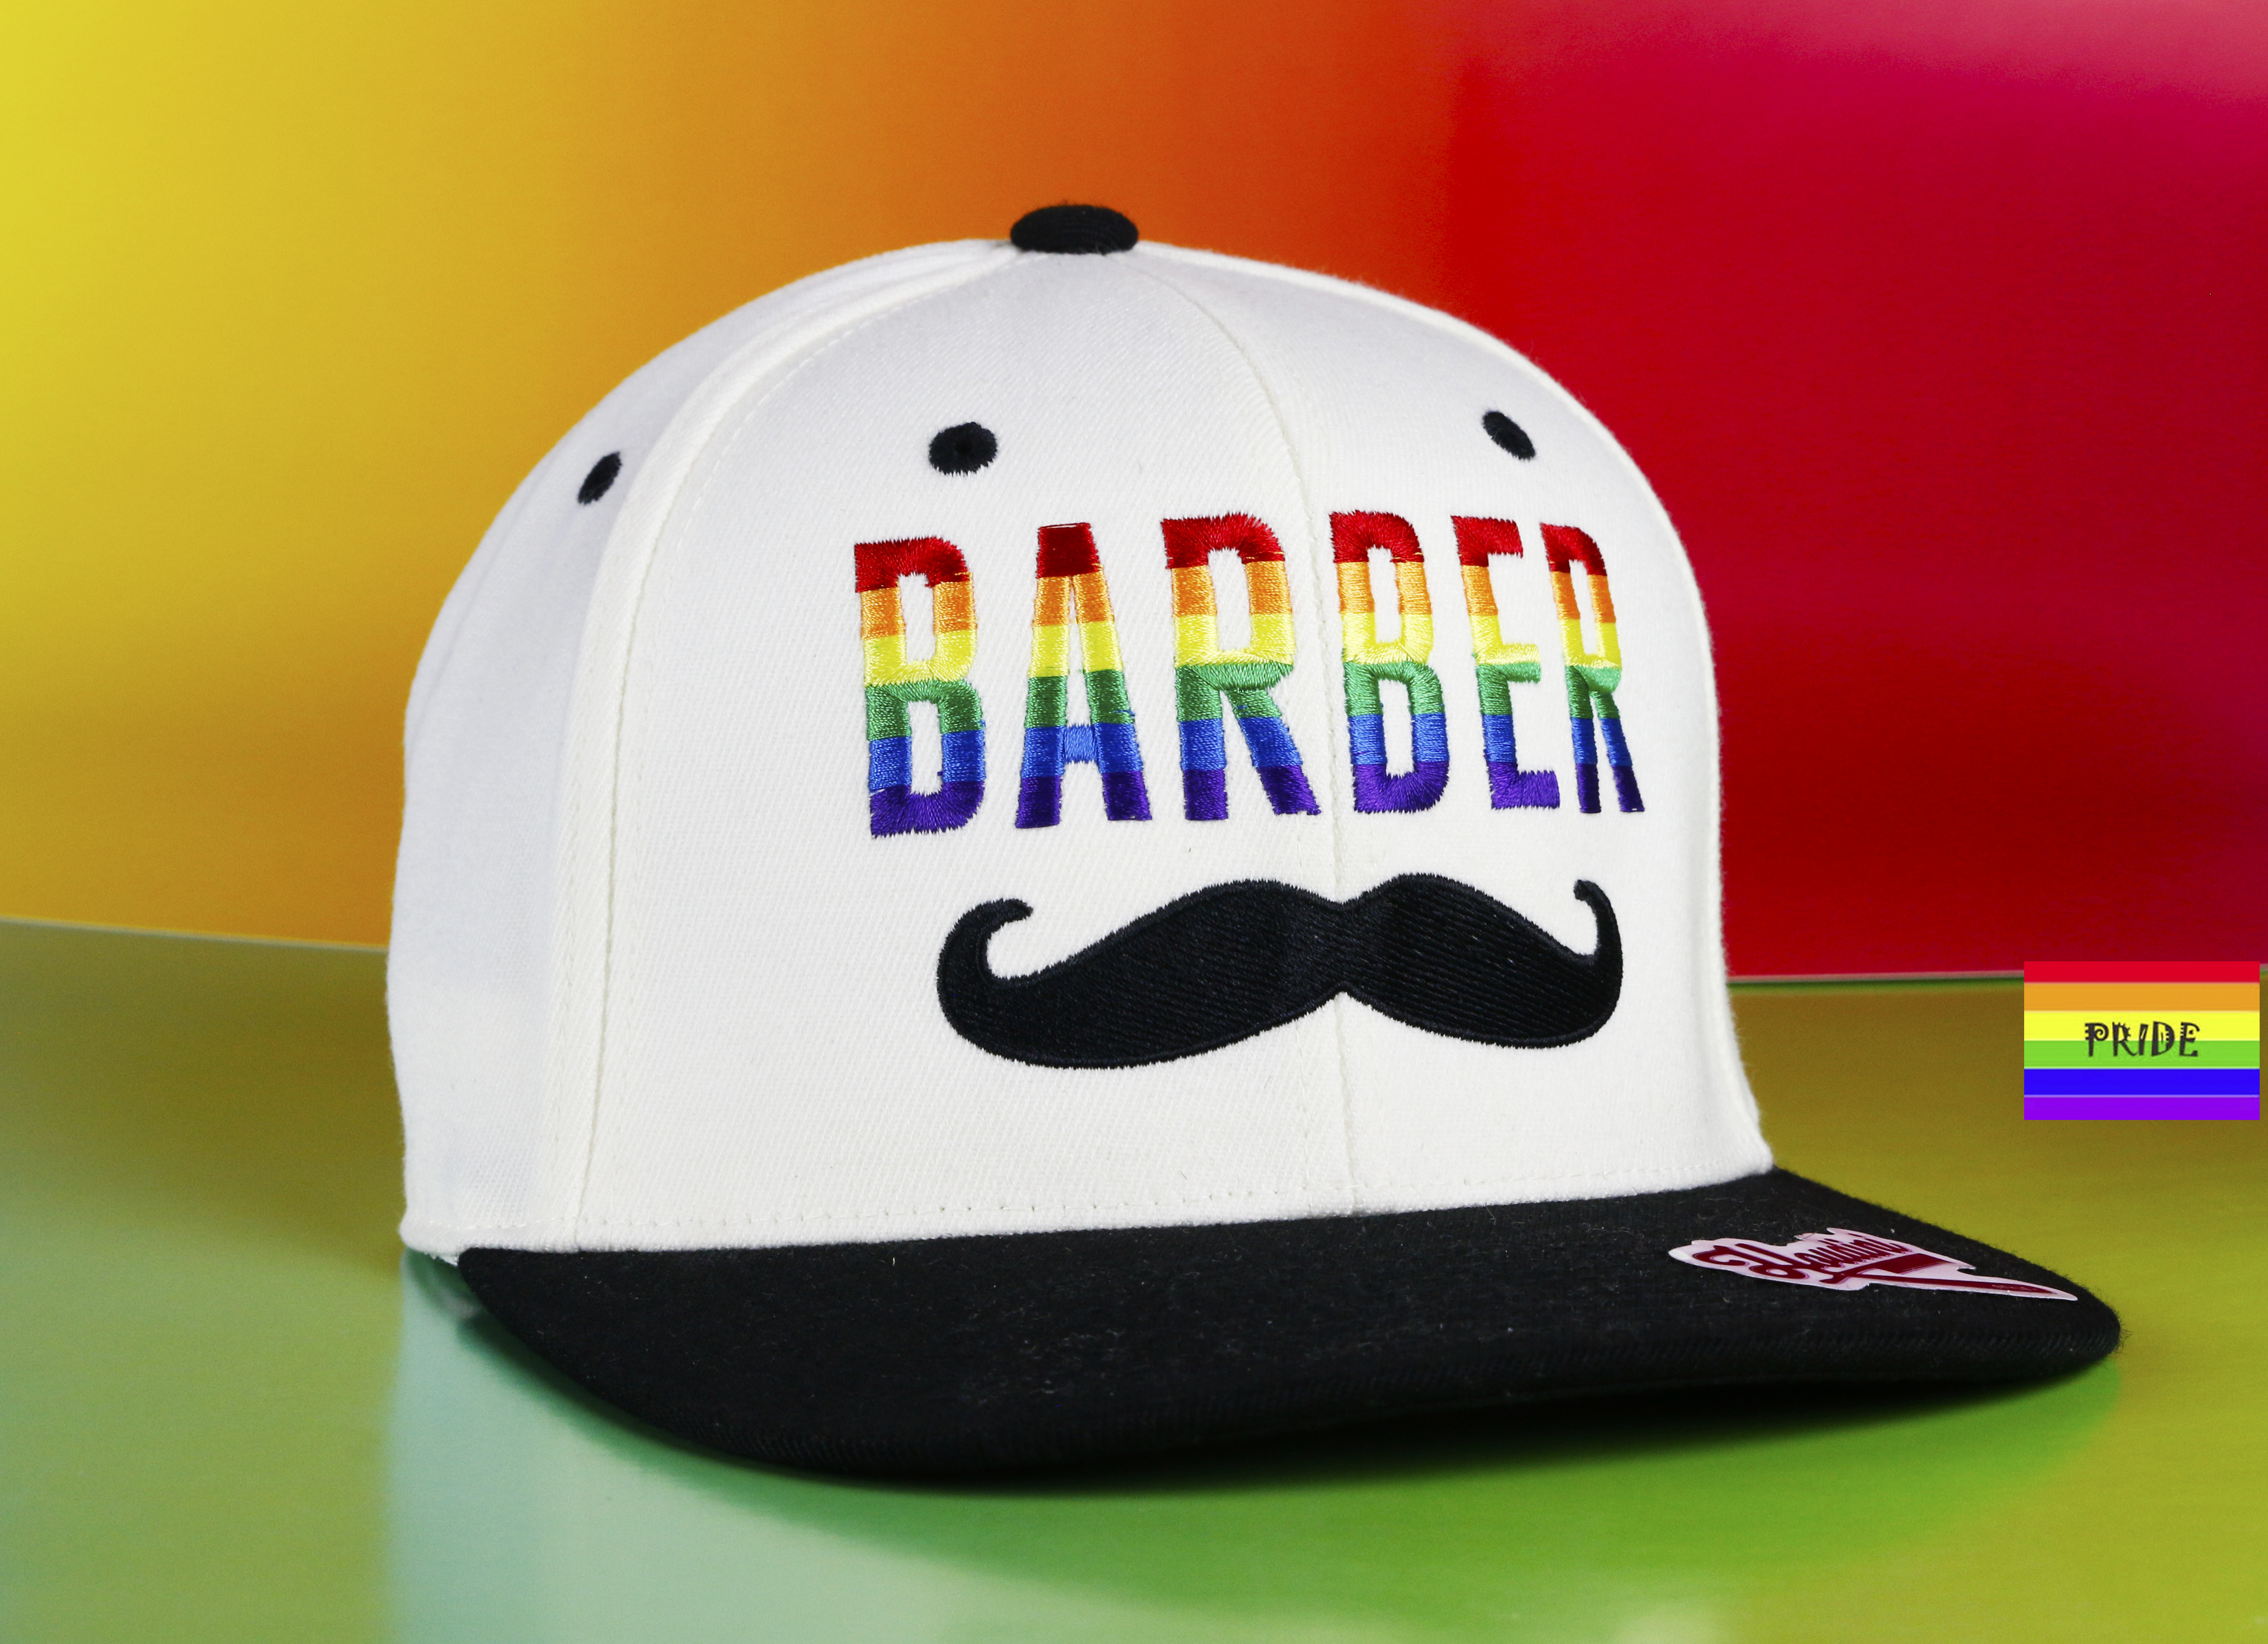 whit pride hat